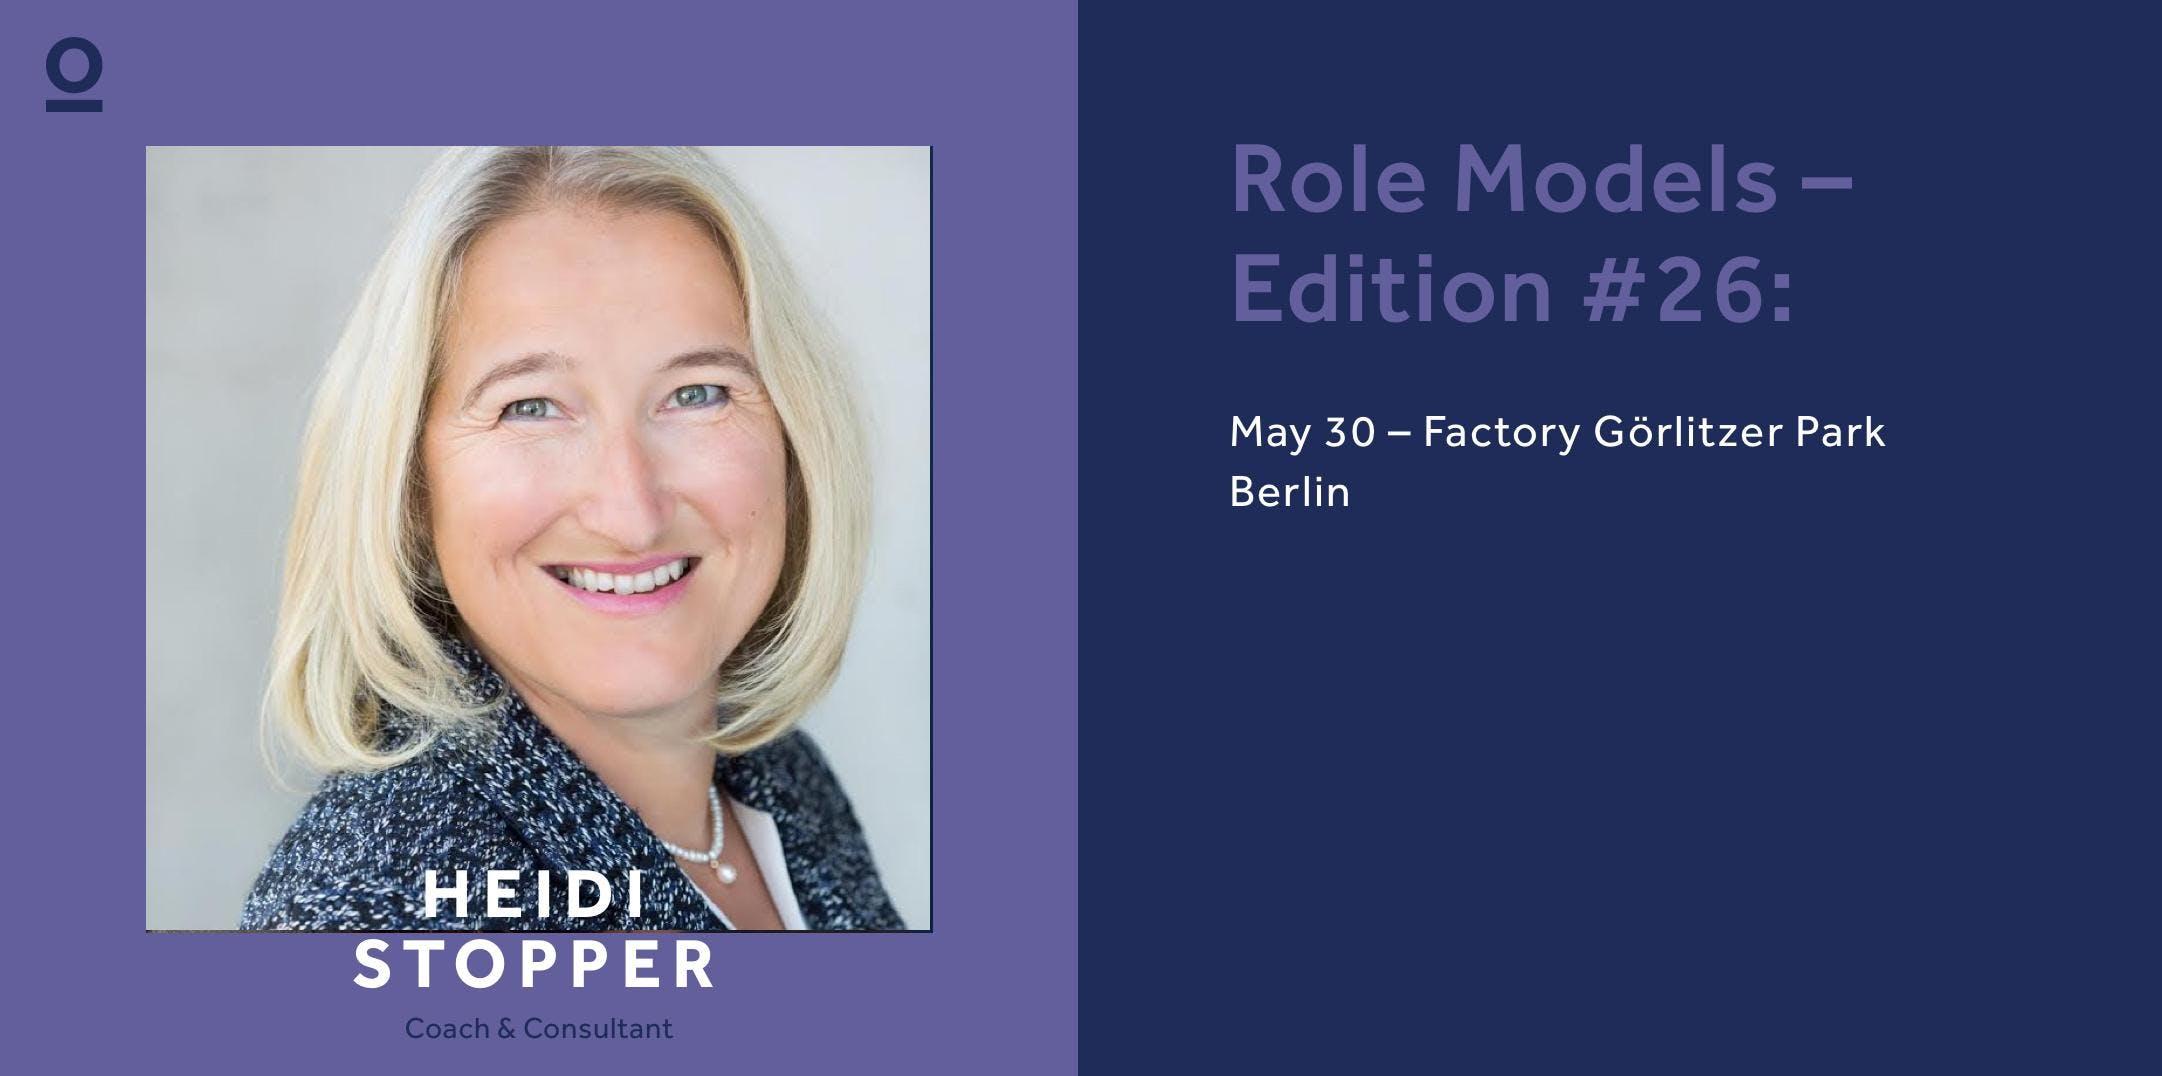 Role Models – Edition #26: Heidi Stopper